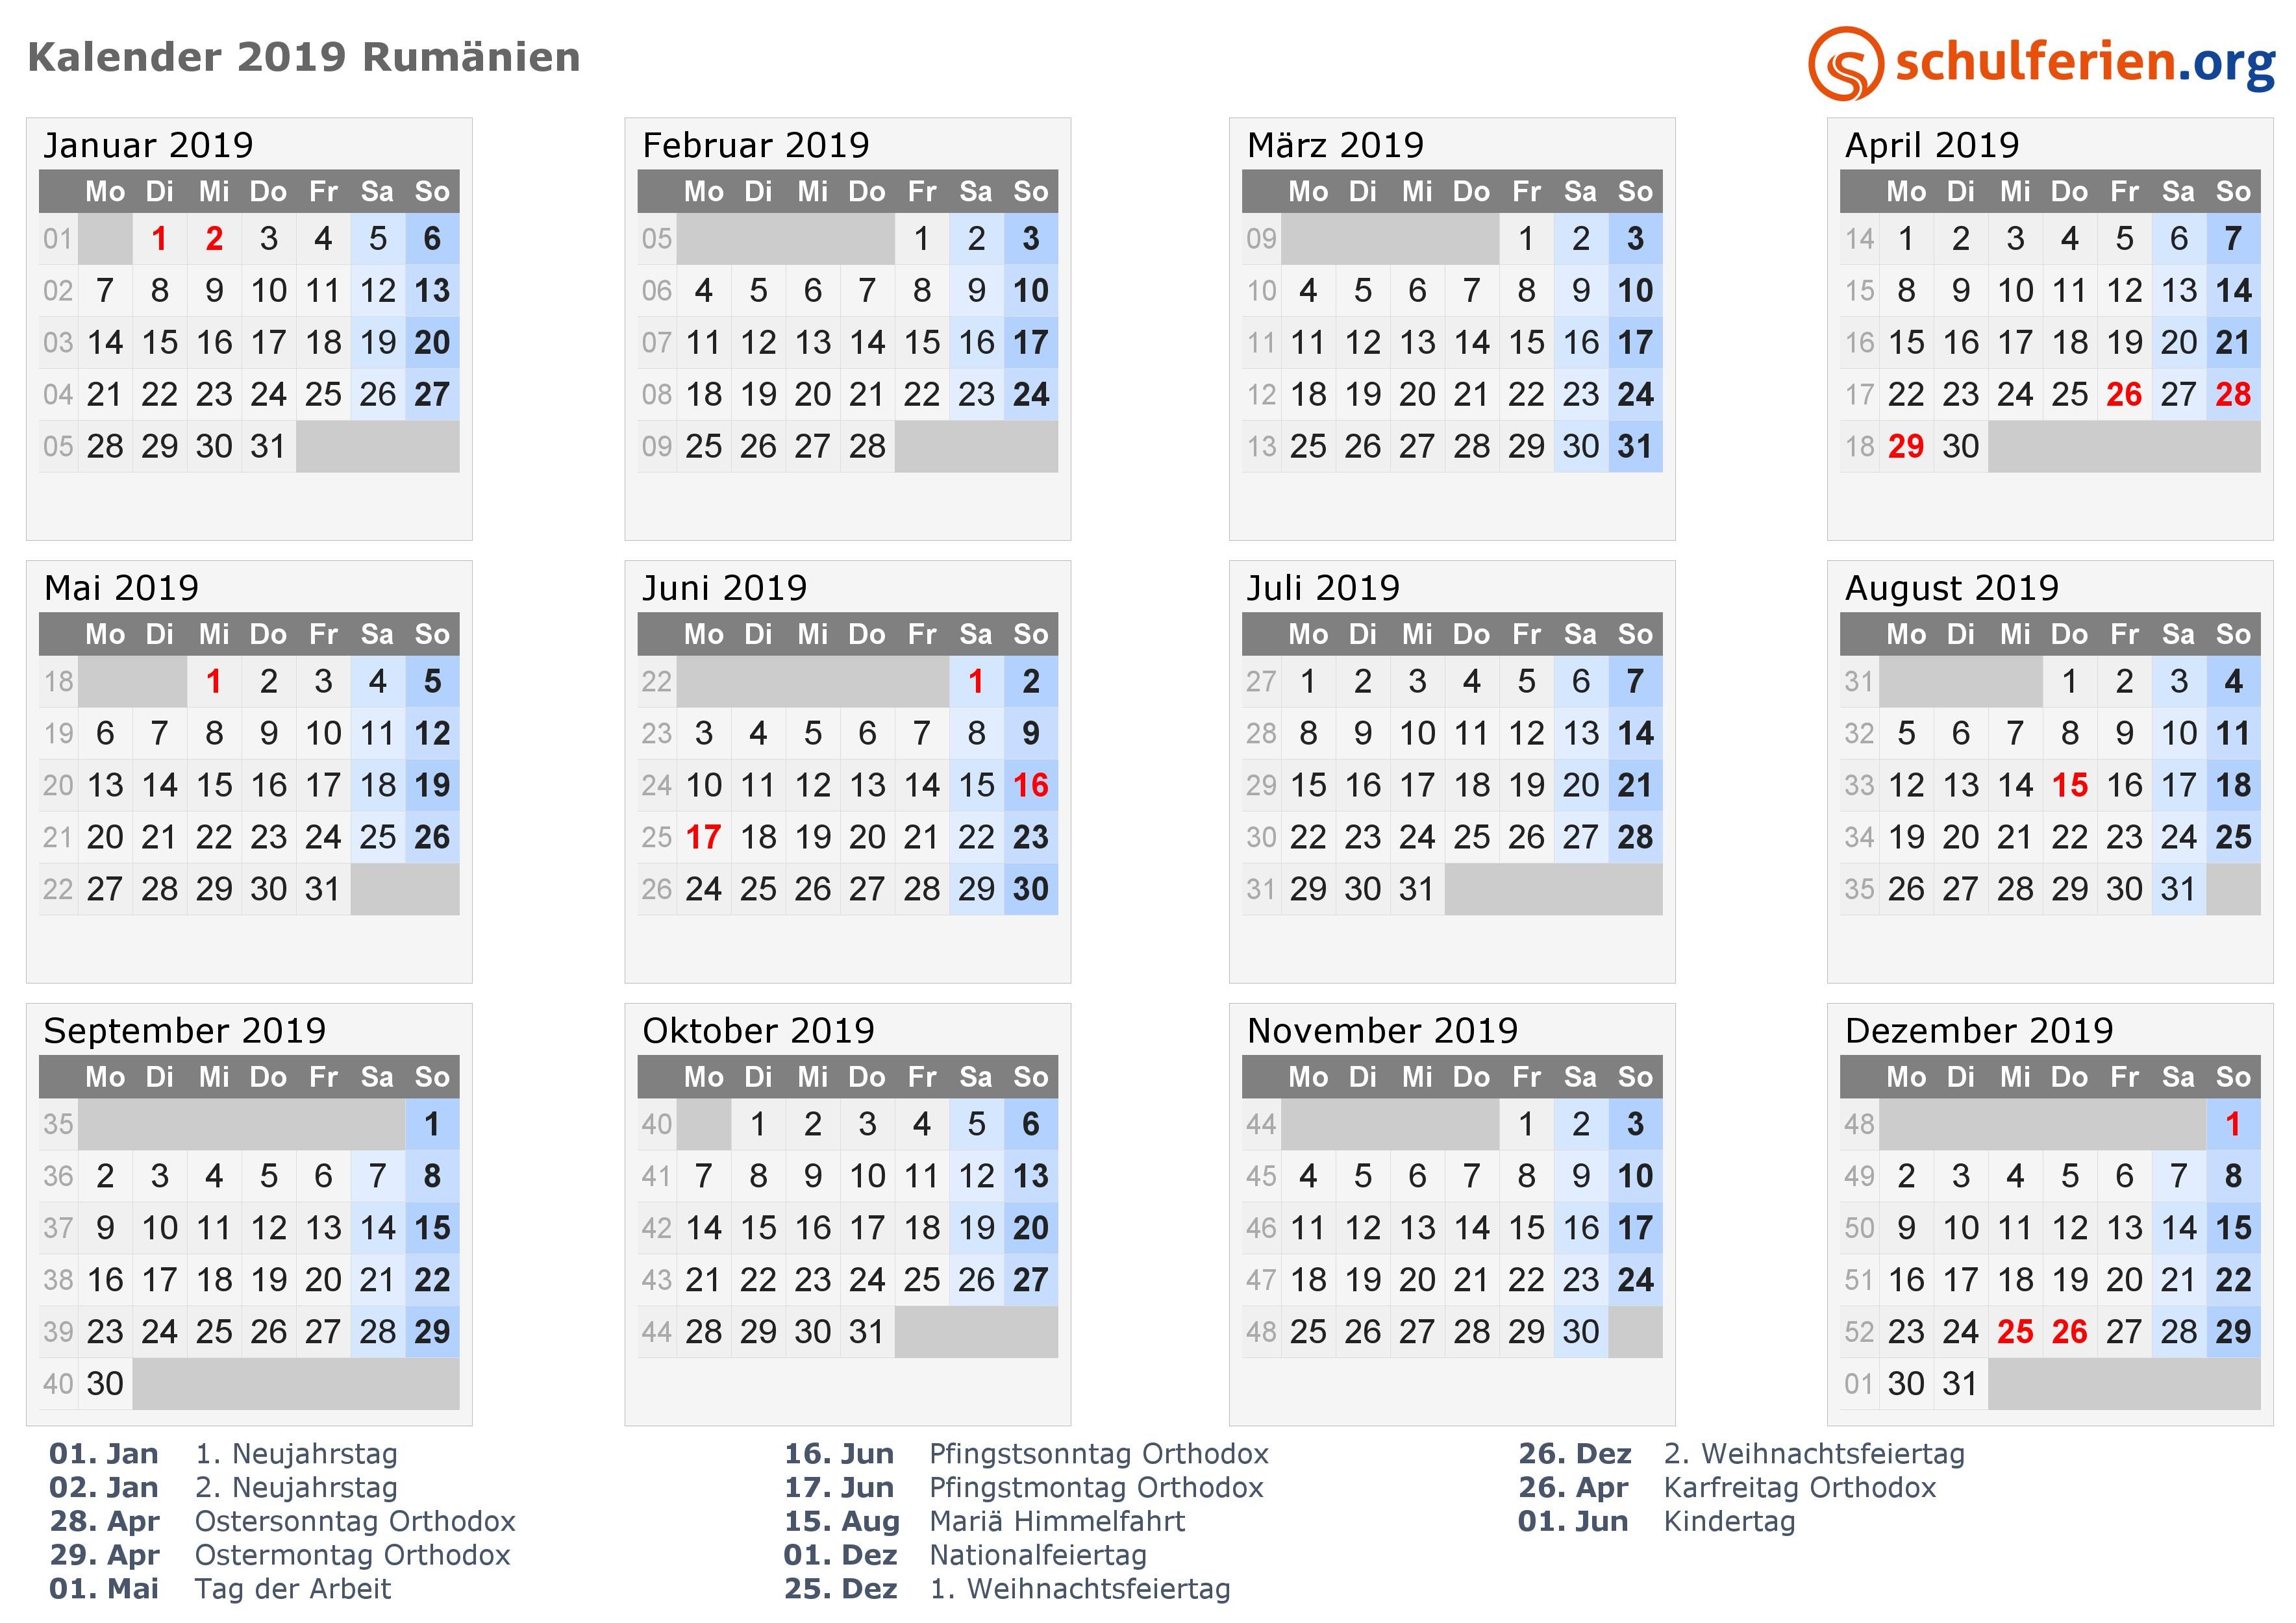 Kalender 2019 Infoagrarfuchss Webseite vinpearl baidaifo